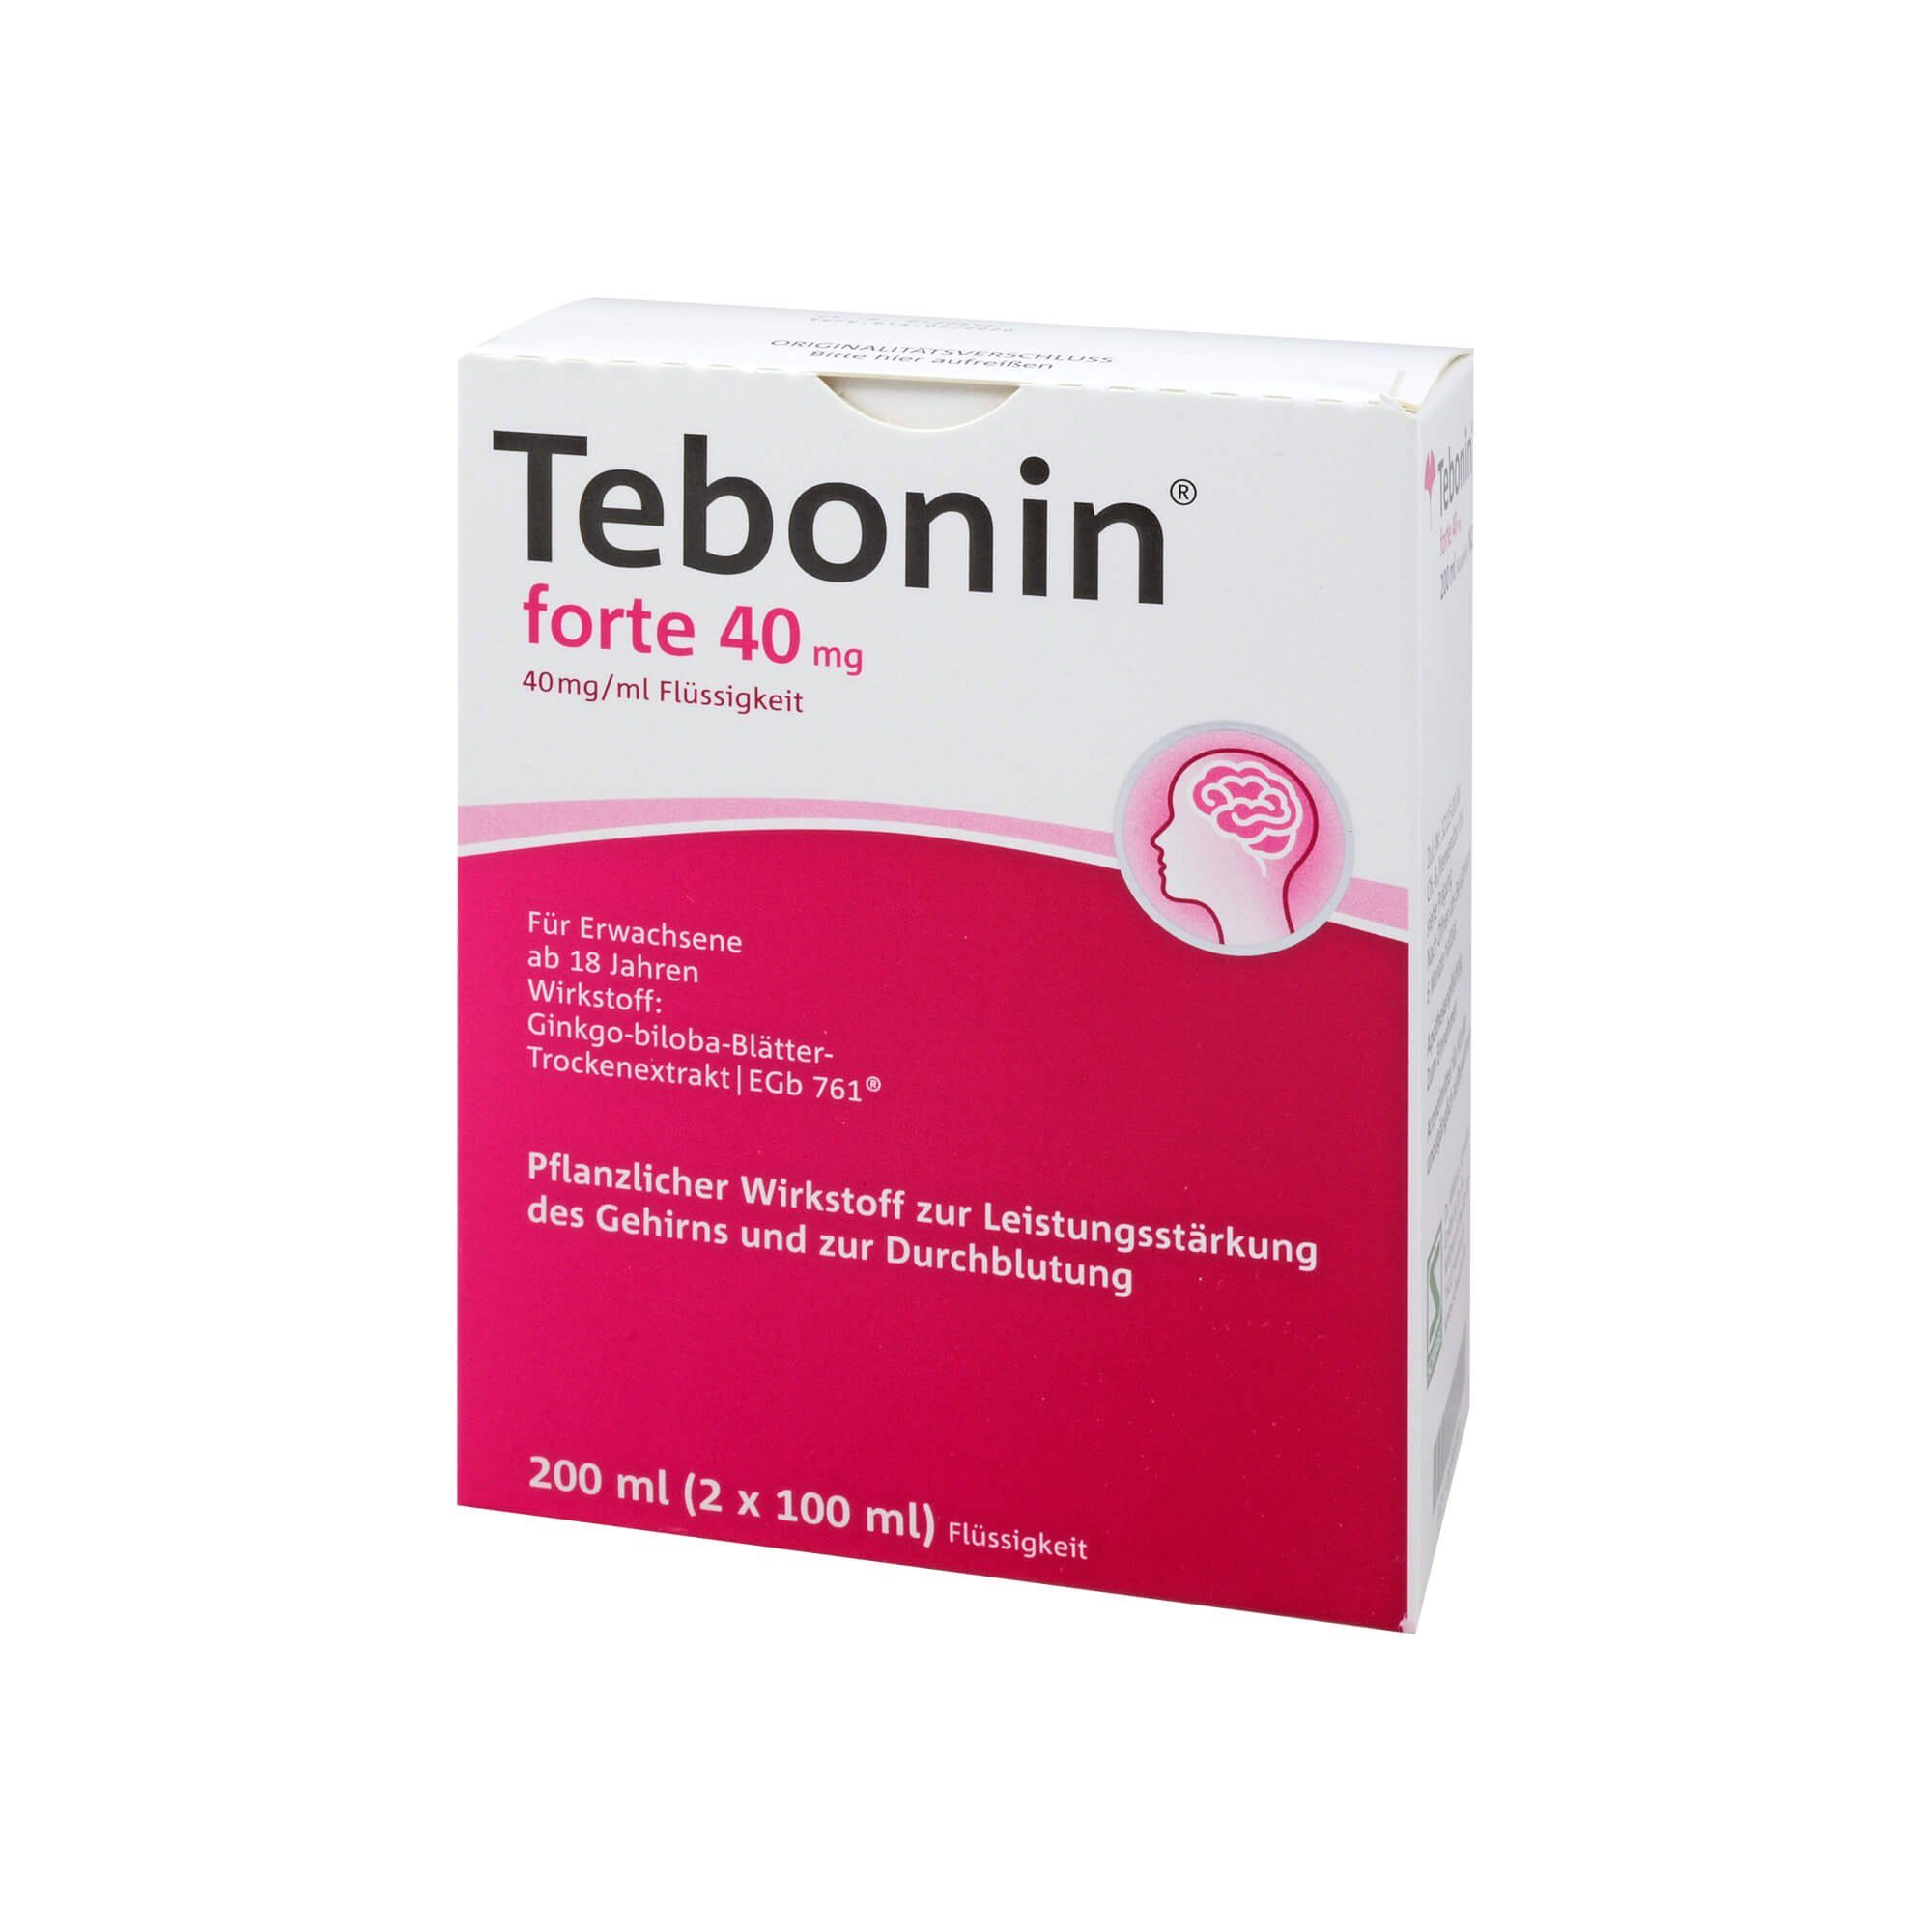 Tebonin forte 40 mg Lösung, 2X100 ml